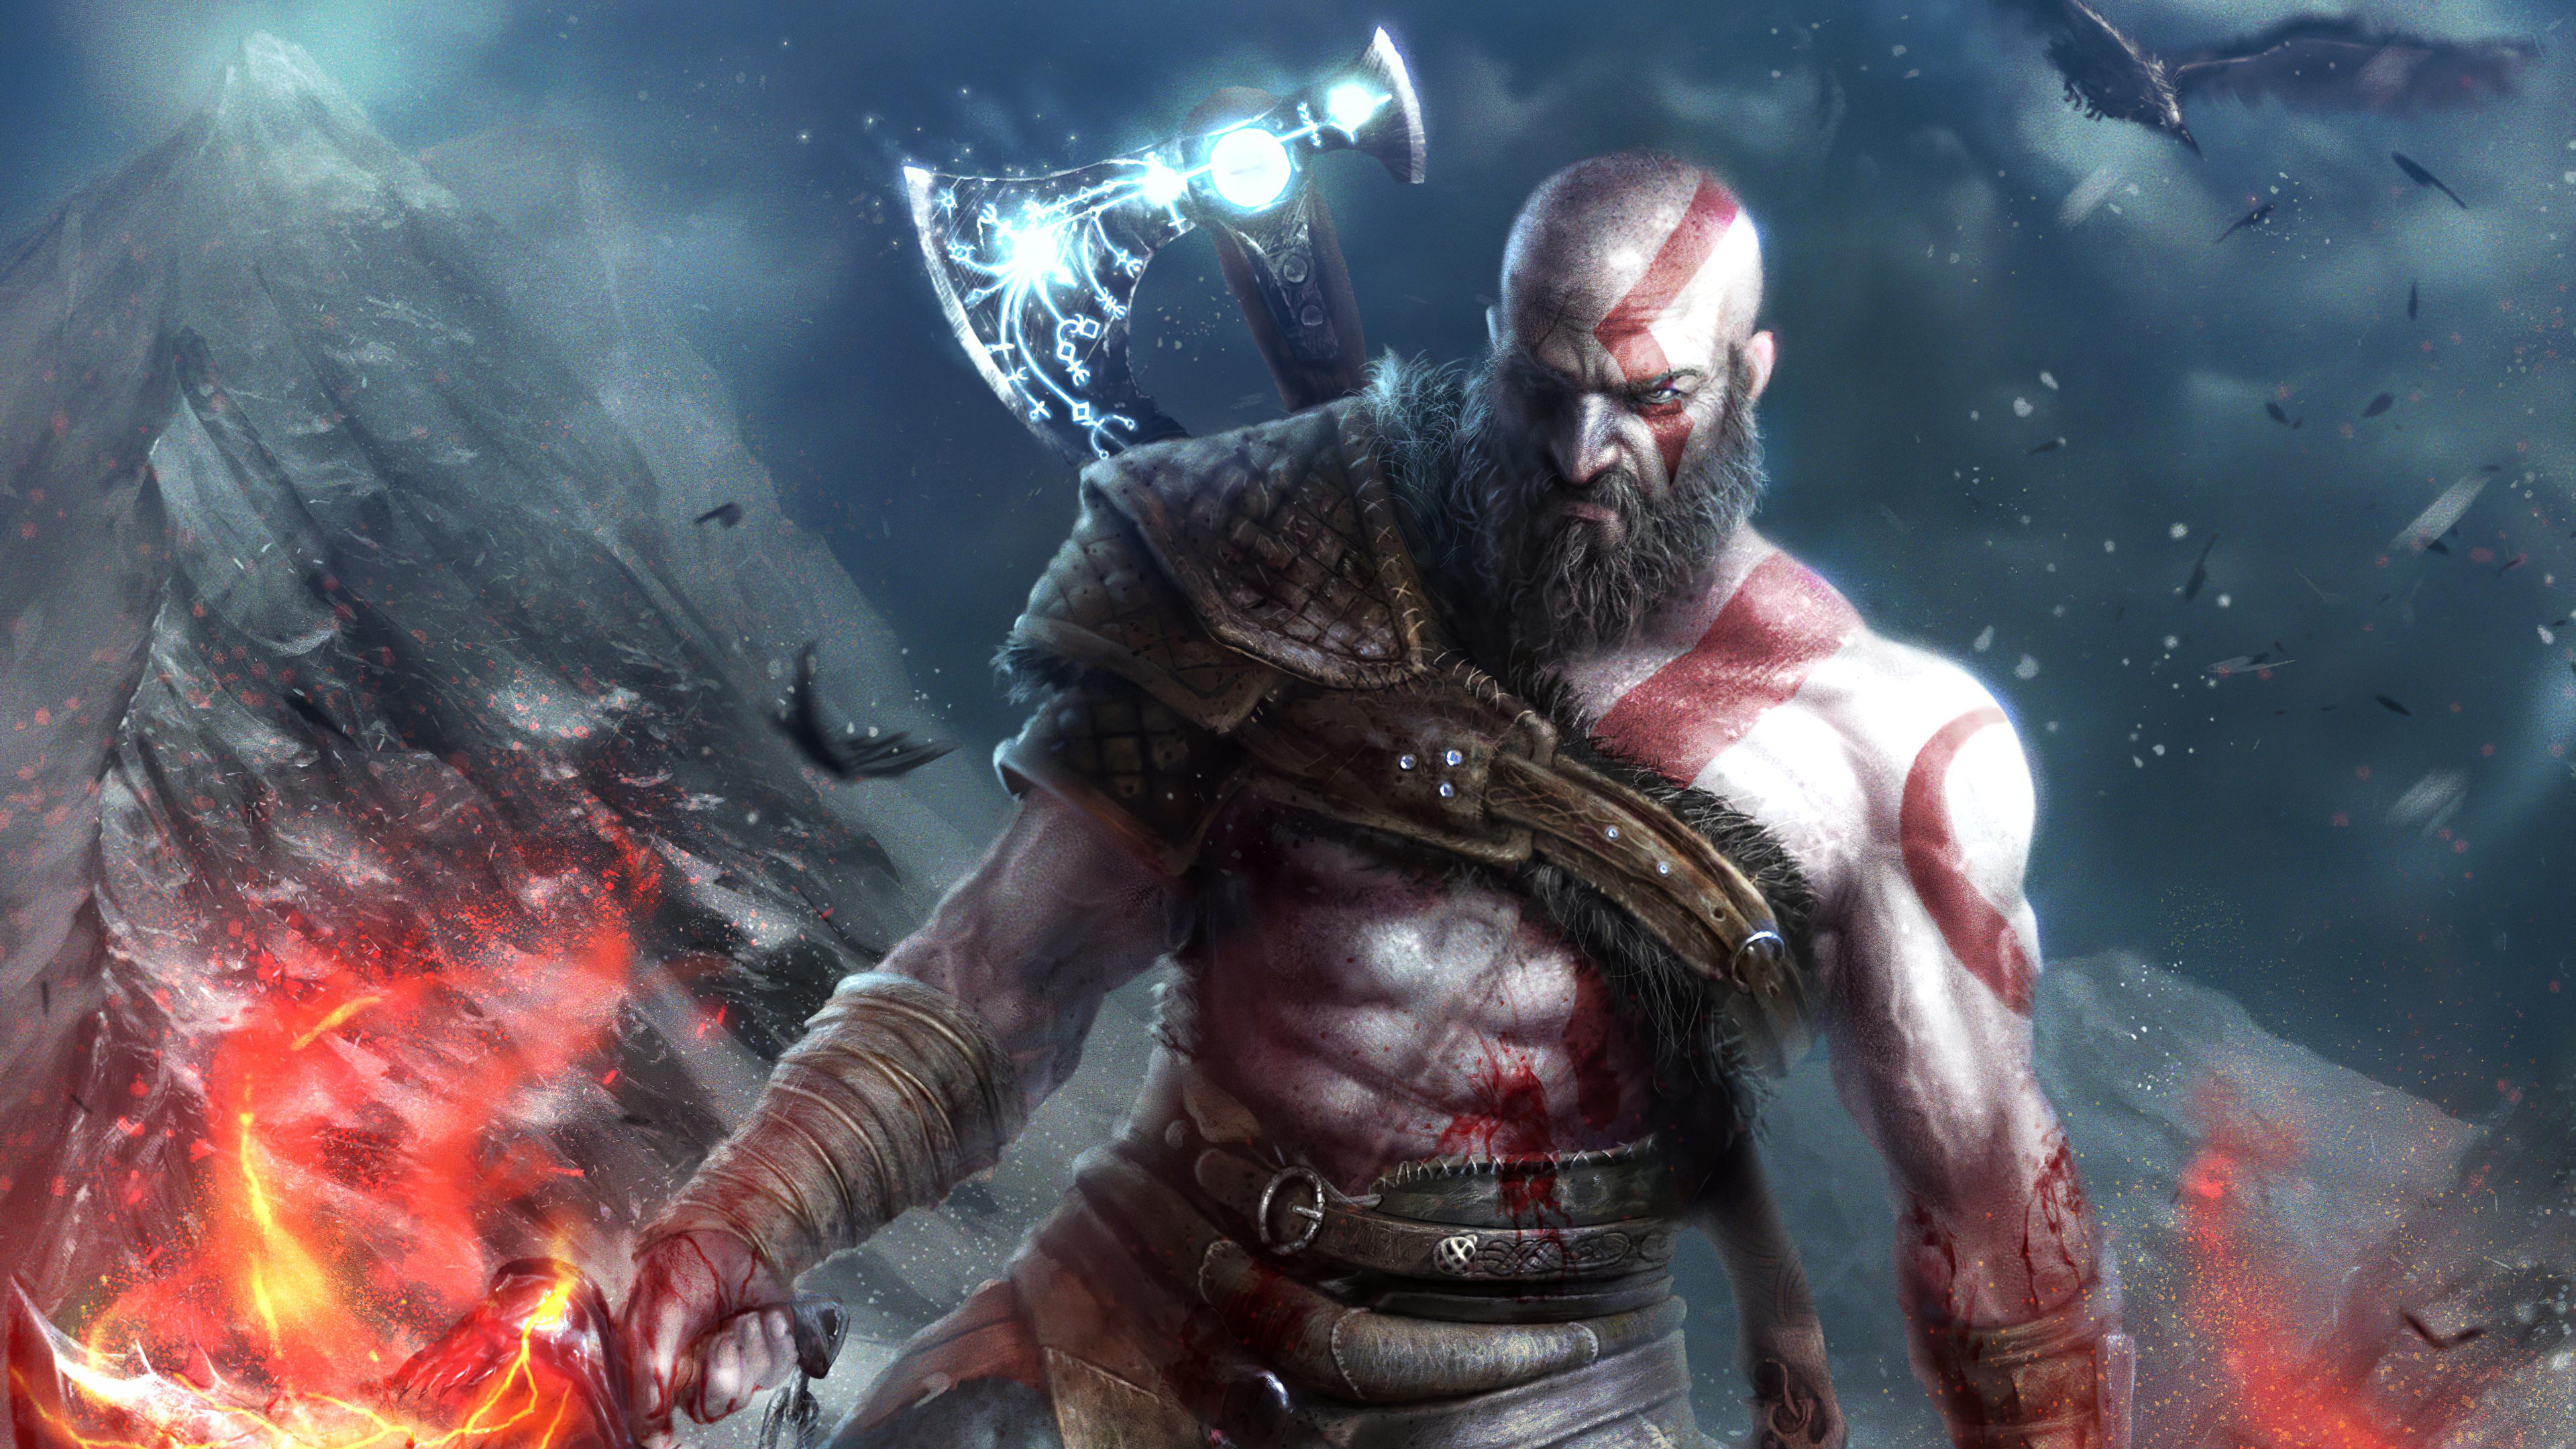 Kratos God Of War Art 4k Hd Games 4k Wallpapers Images